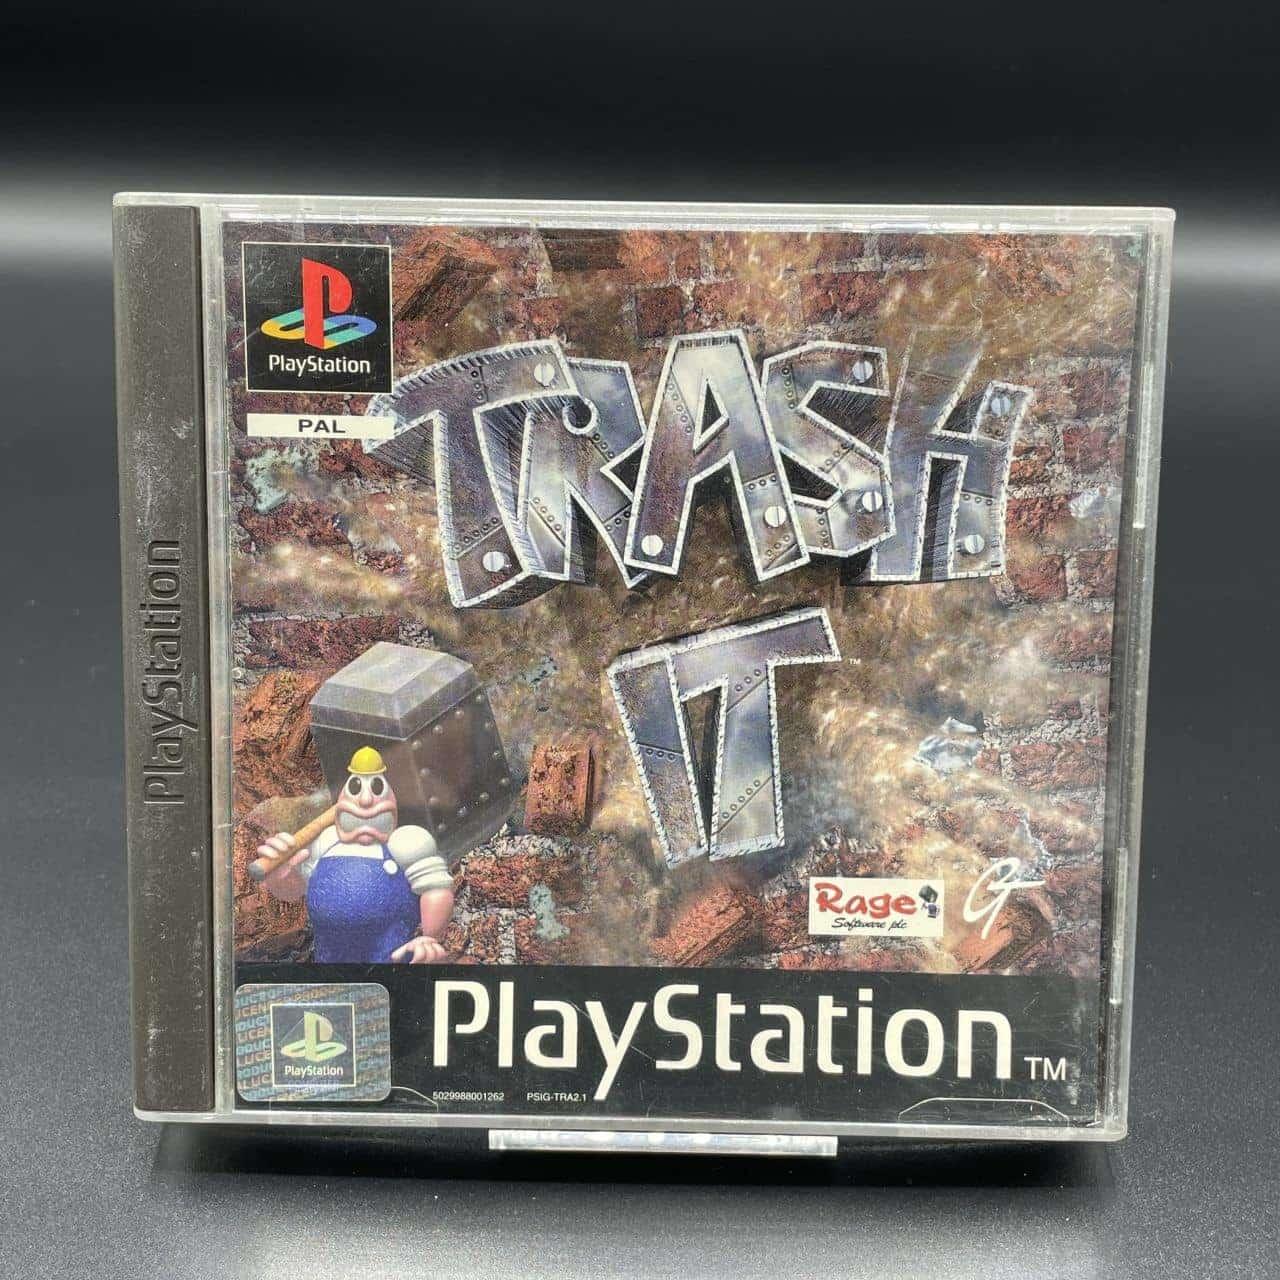 PS1 Trash It (Komplett) (Gebrauchsspuren) Sony PlayStation 1